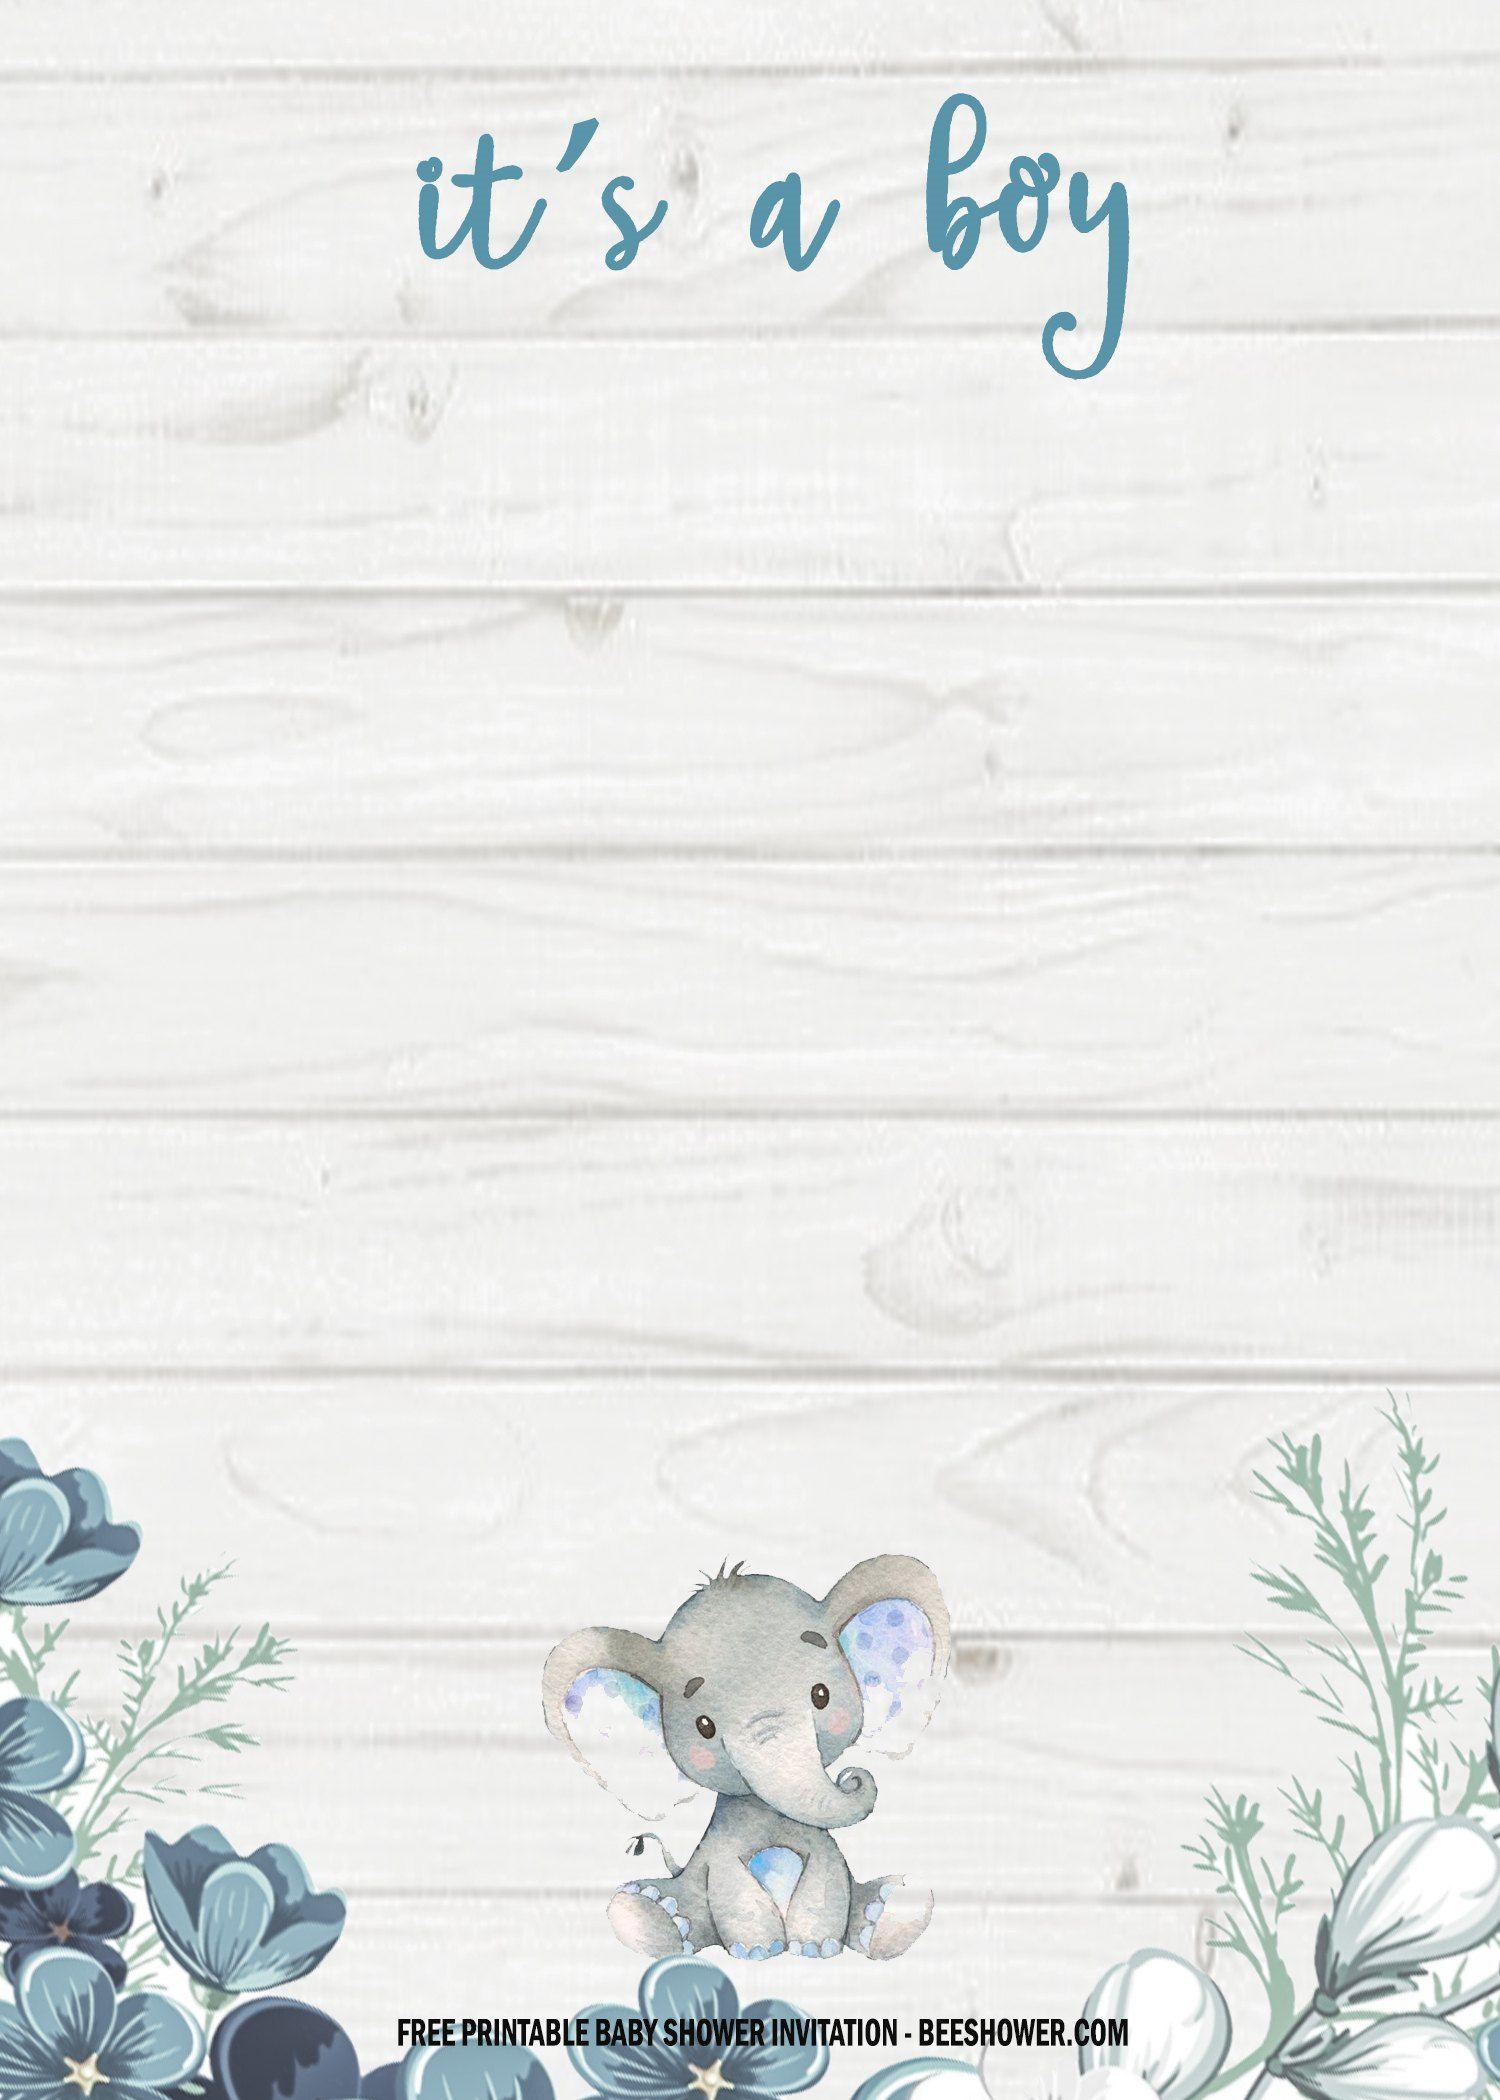 Elephant Baby Shower Invitation Templates Free